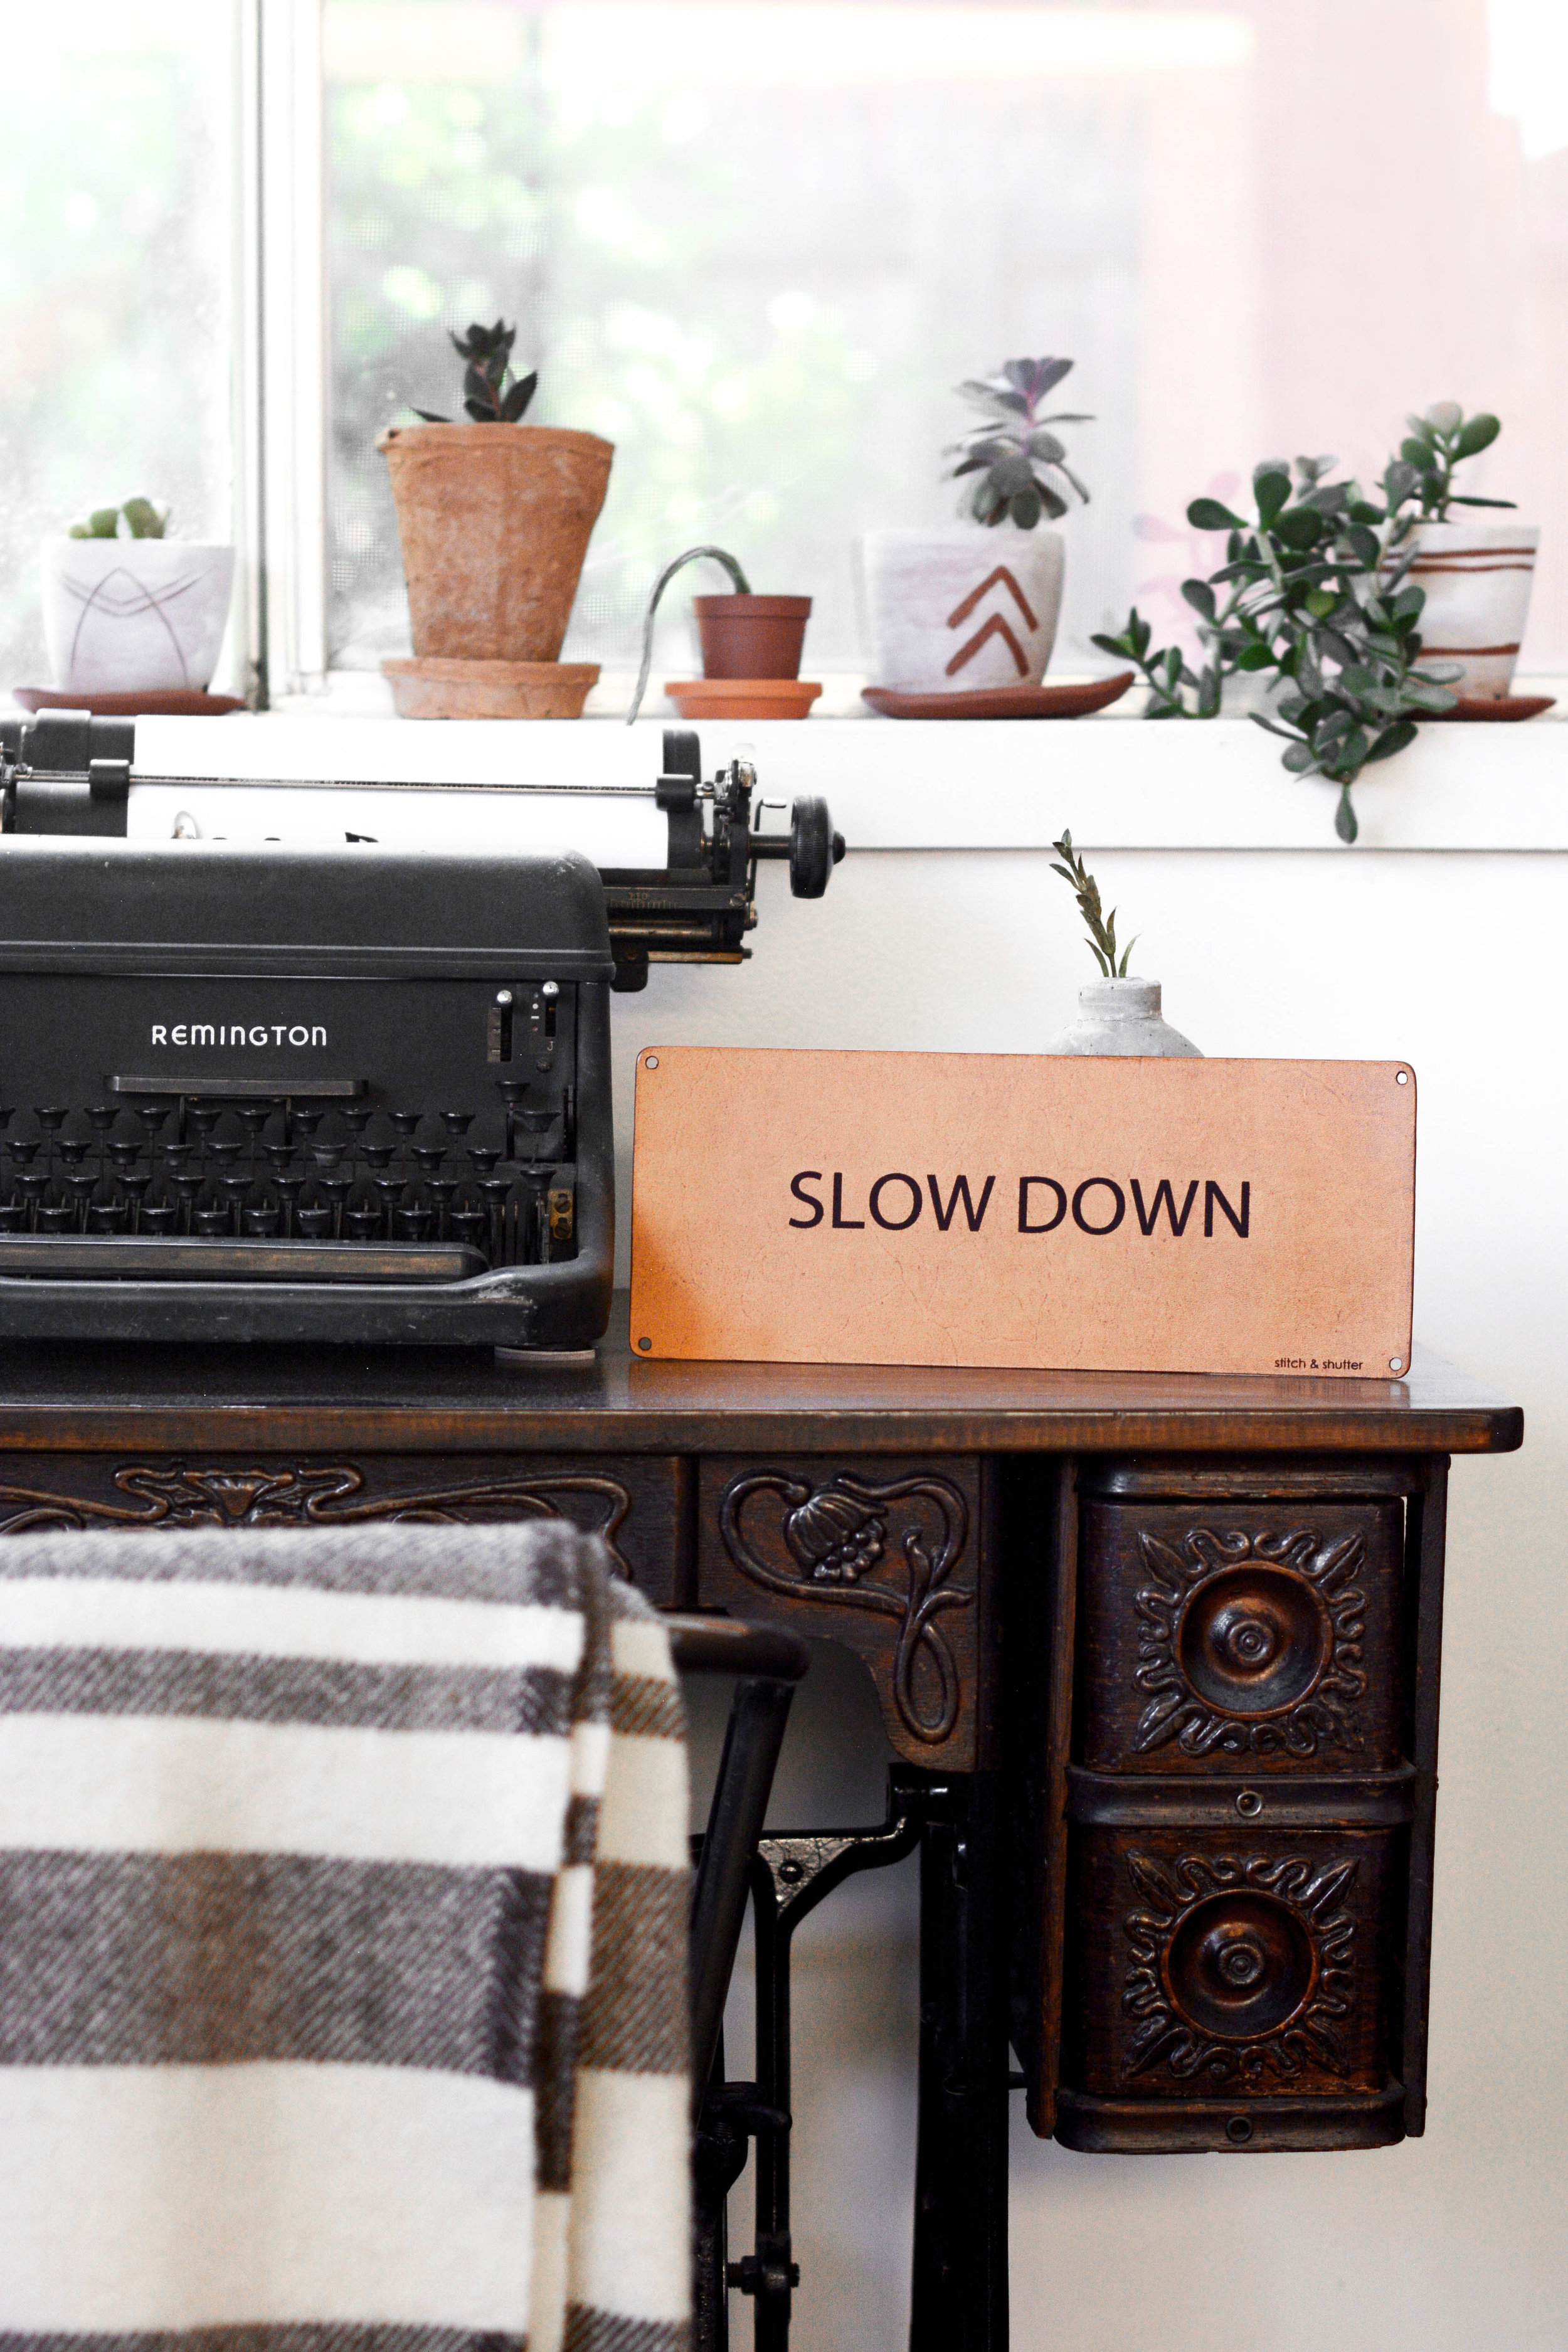 slow-down-sign-desk.jpg